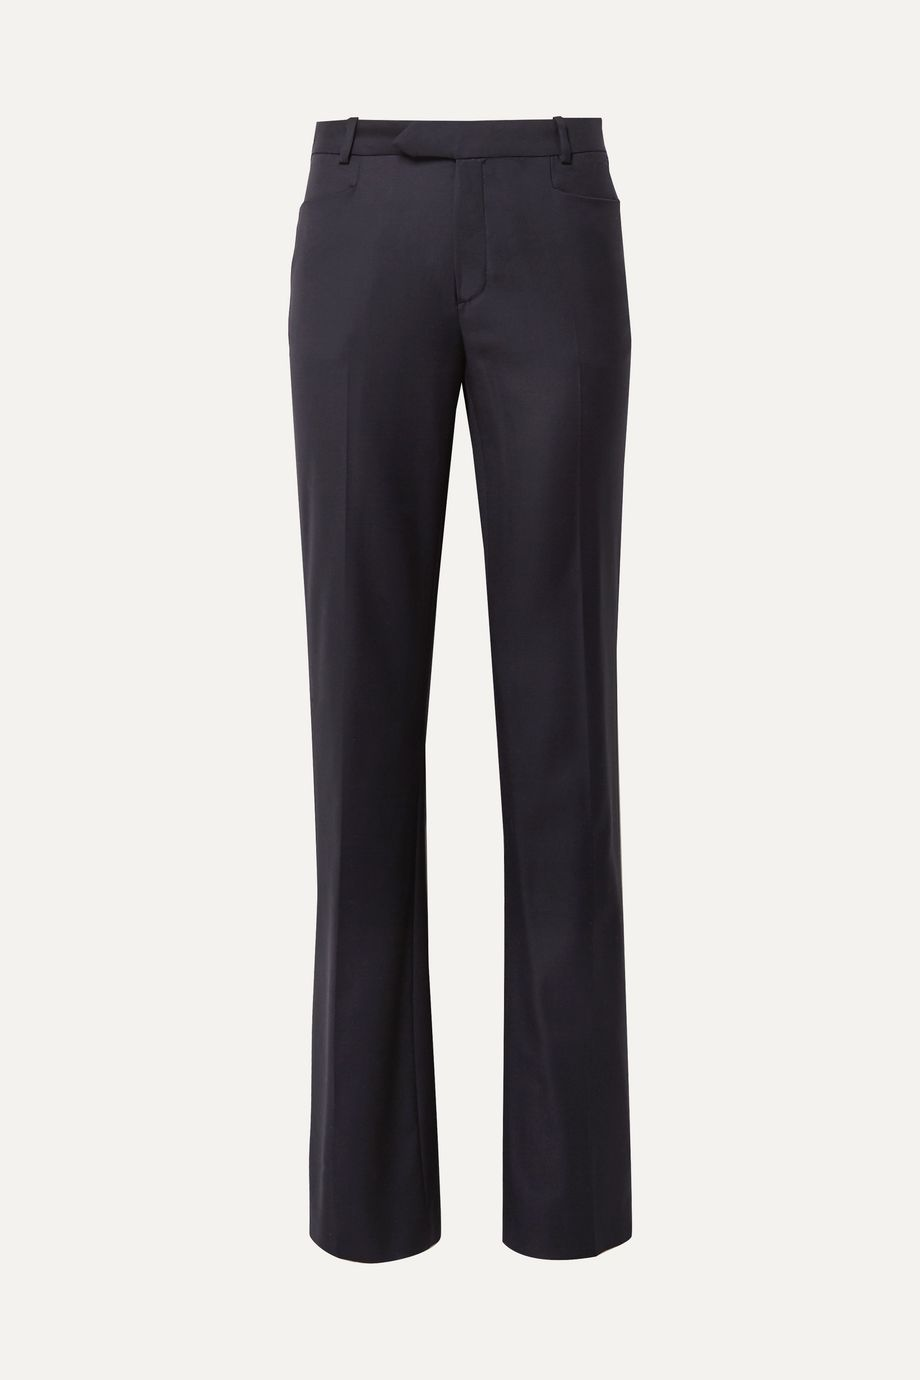 Joseph Rocker Super 100 wool-twill wide-leg pants